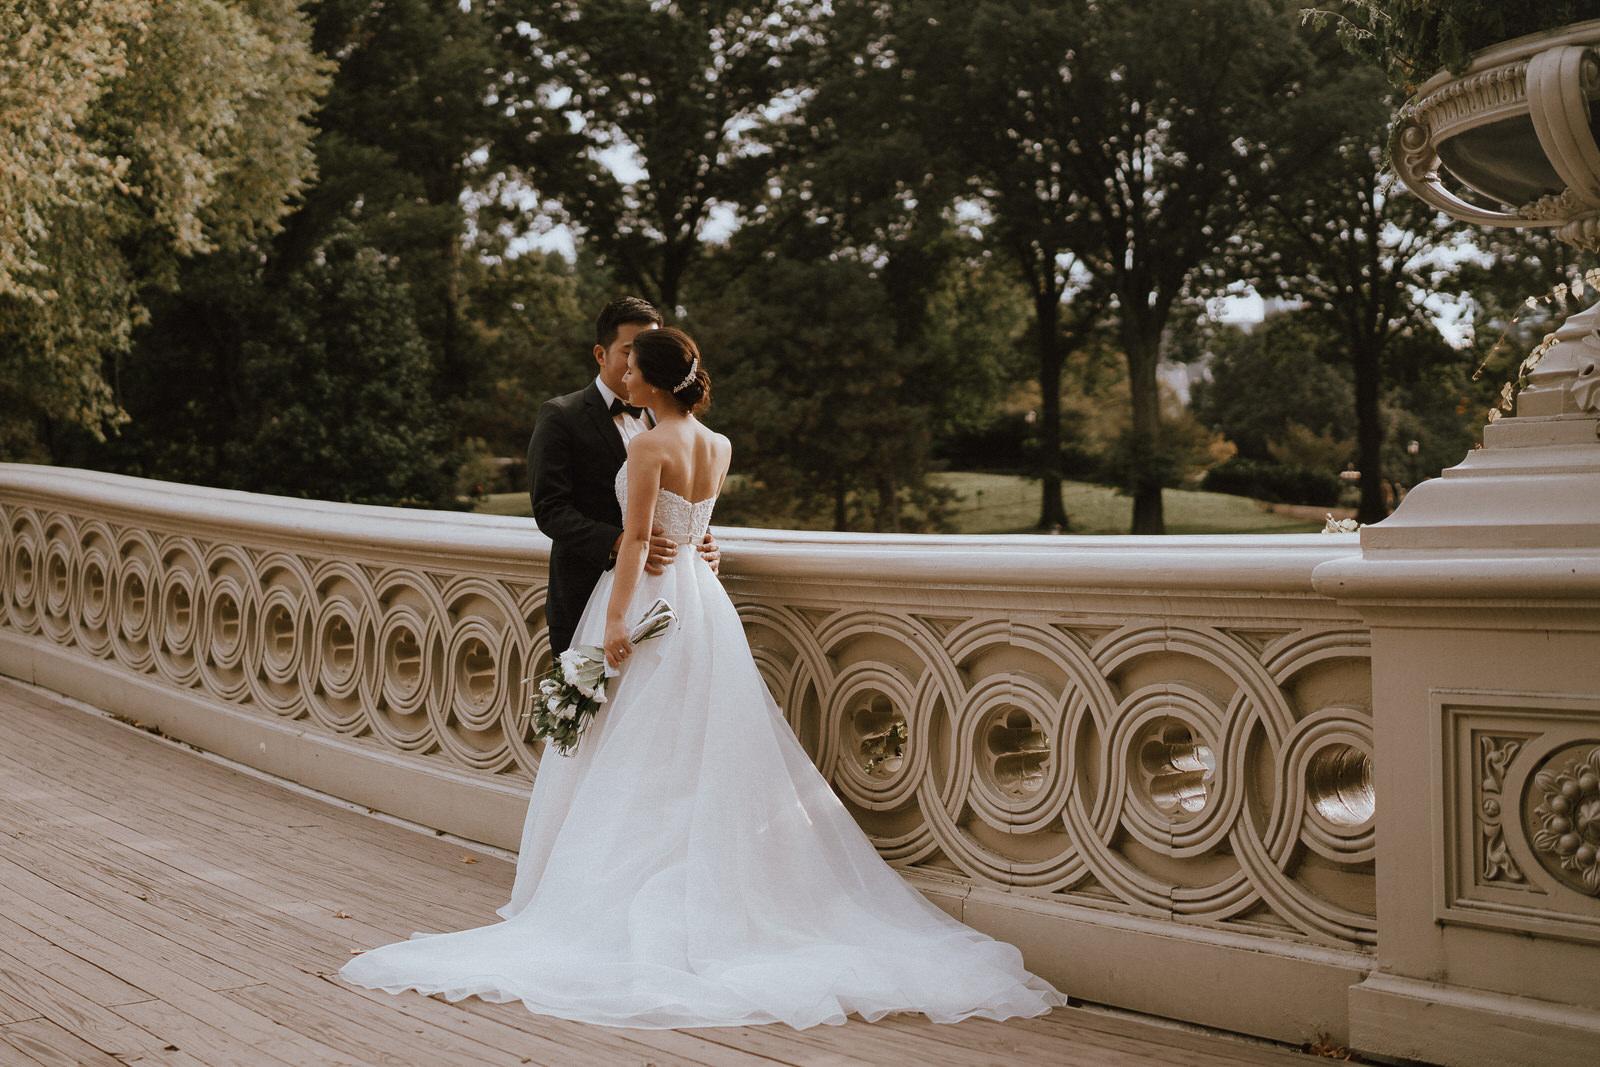 Central Park Elopement Photos-Bow Bridge-Michelle Gonzalez Photography- New York Wedding Photographer-25.jpg